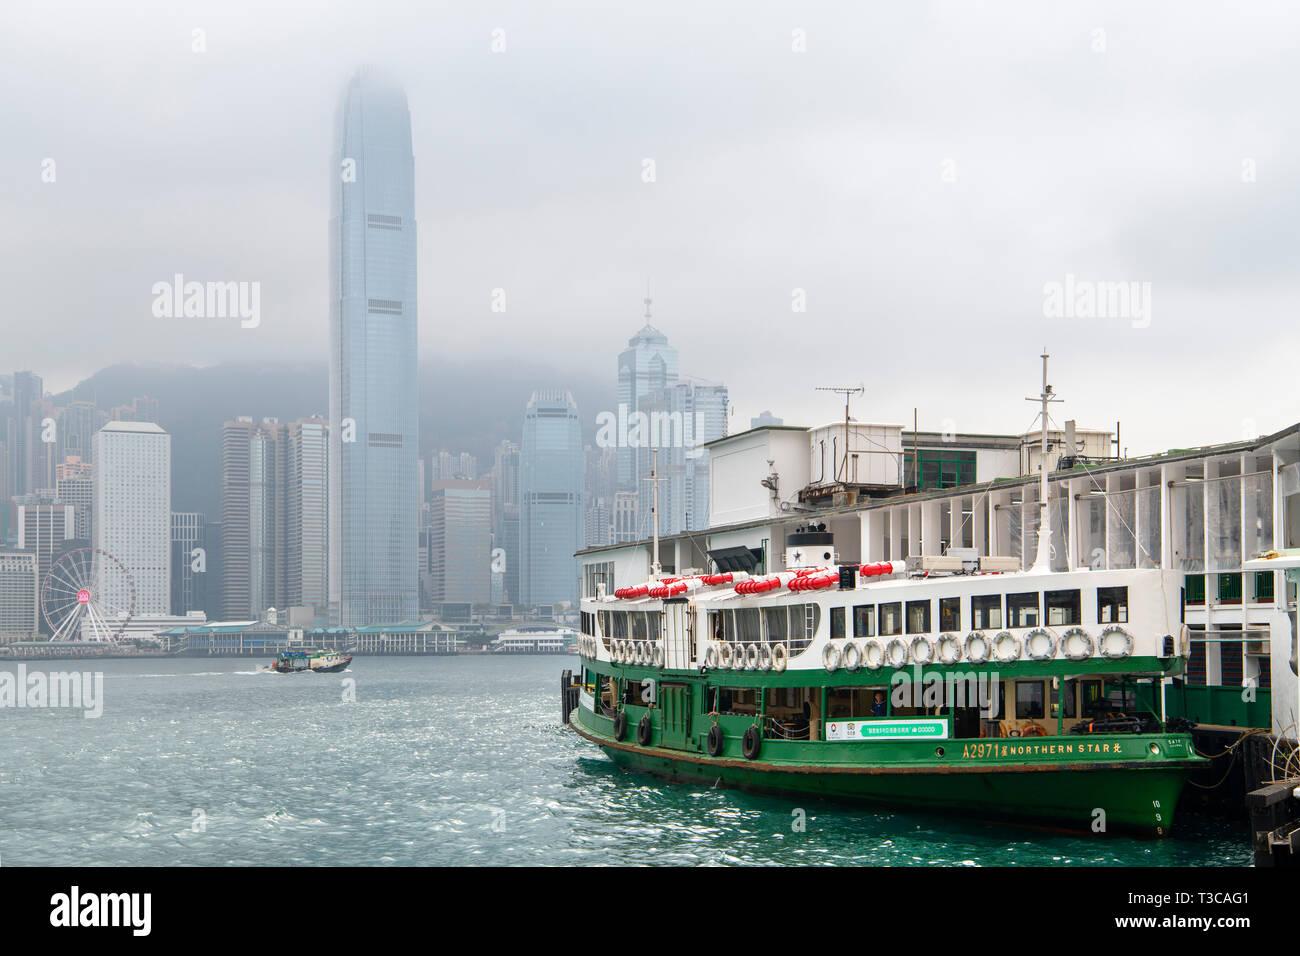 Star Ferry, Hong Kong. Ferry at Kowloon Ferry Terminal looking towards Two International Finance Centre on Hong Kong Island, Tsim Sha Tsui, Hong Kong Stock Photo